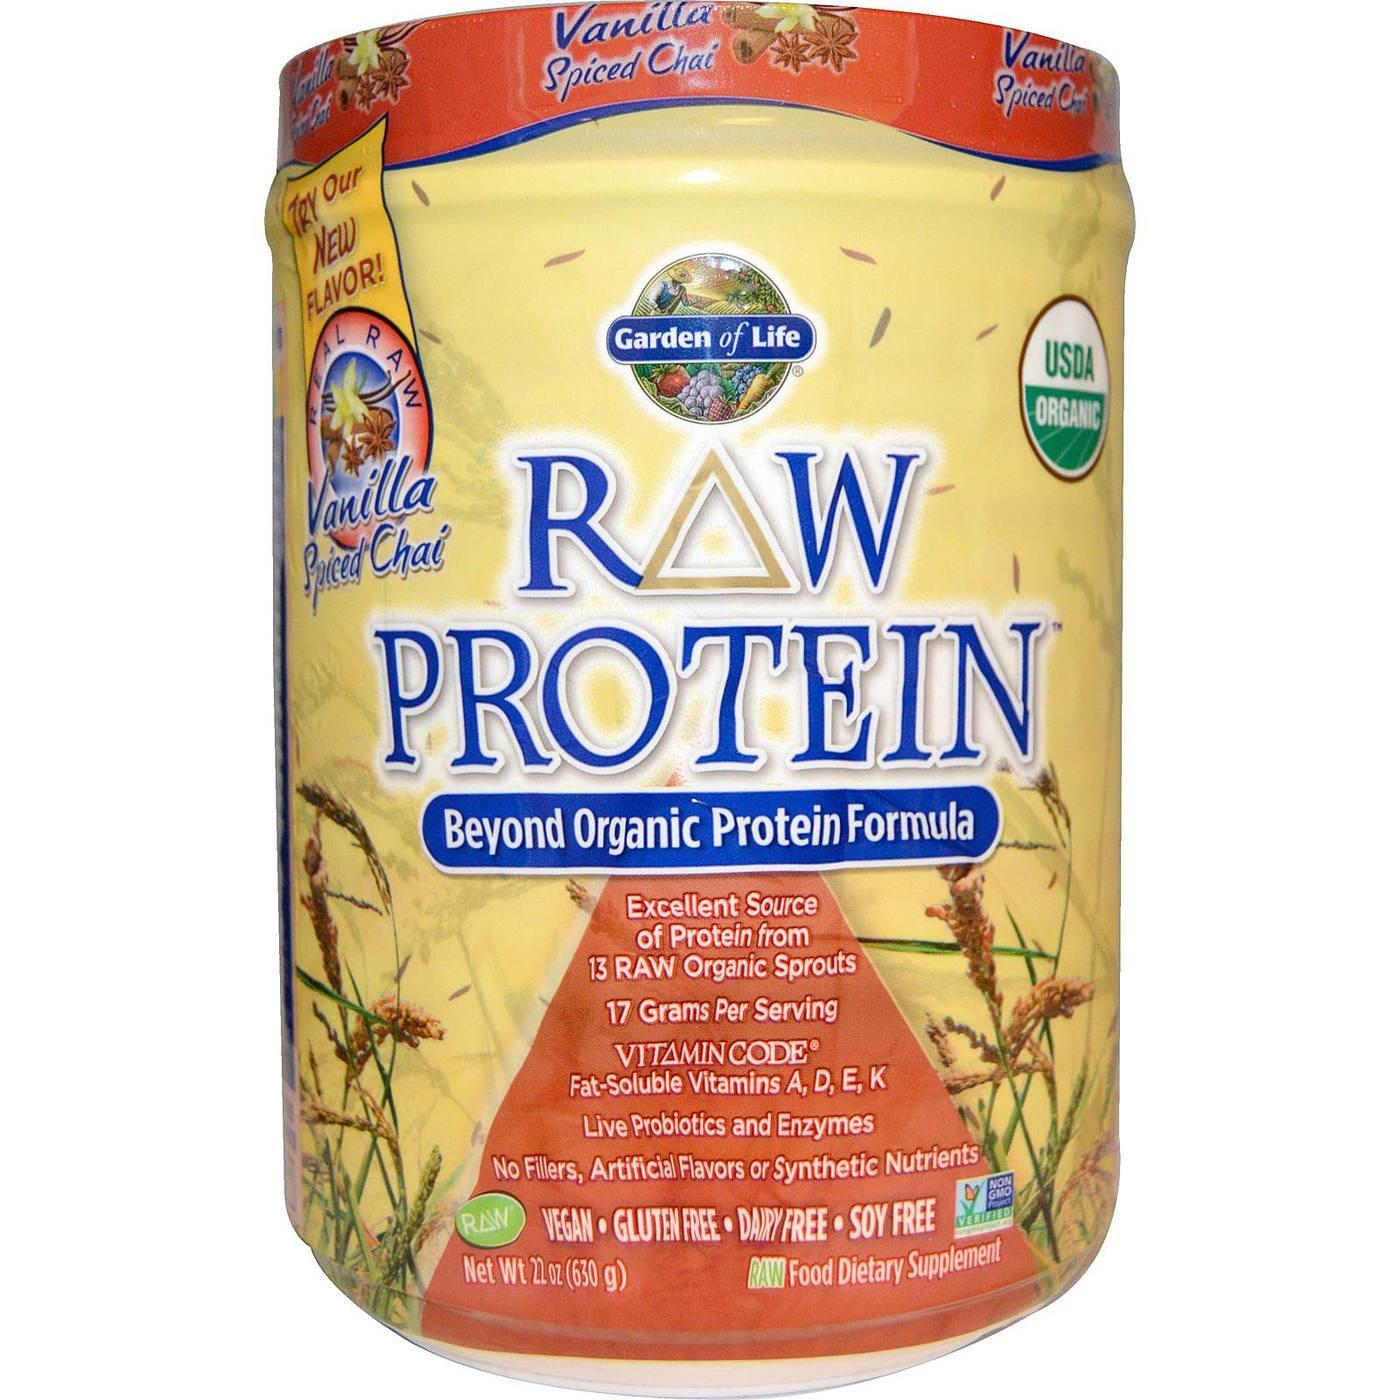 Garden Of Life Raw Protein Vanilla Spiced Chai 22 Oz